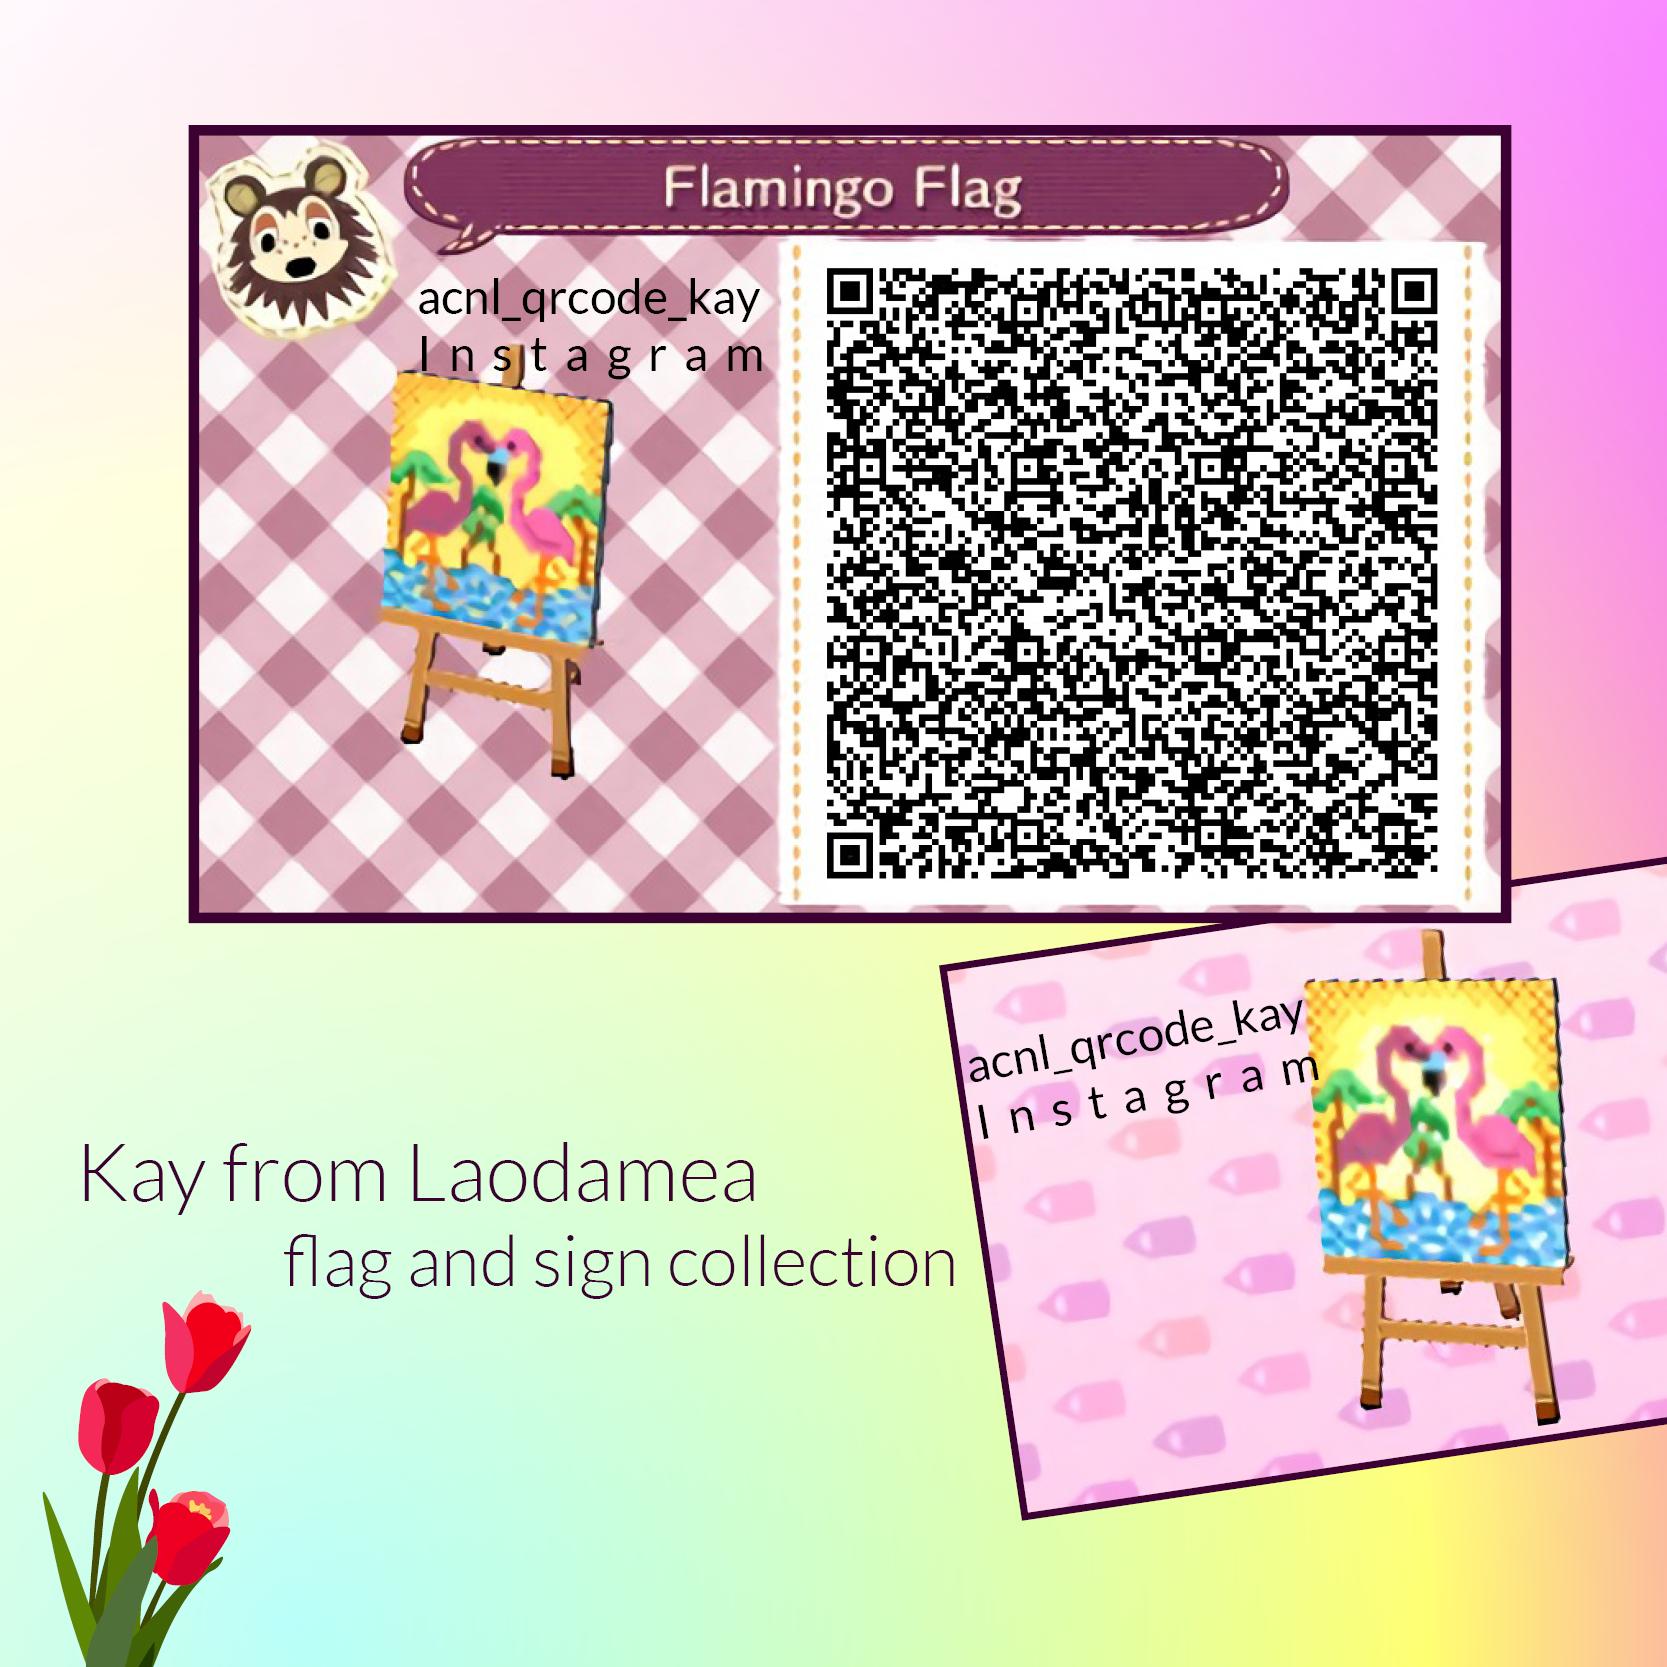 Qr Code Flamingo Flag Qr Codes Animals Animal Crossing Qr